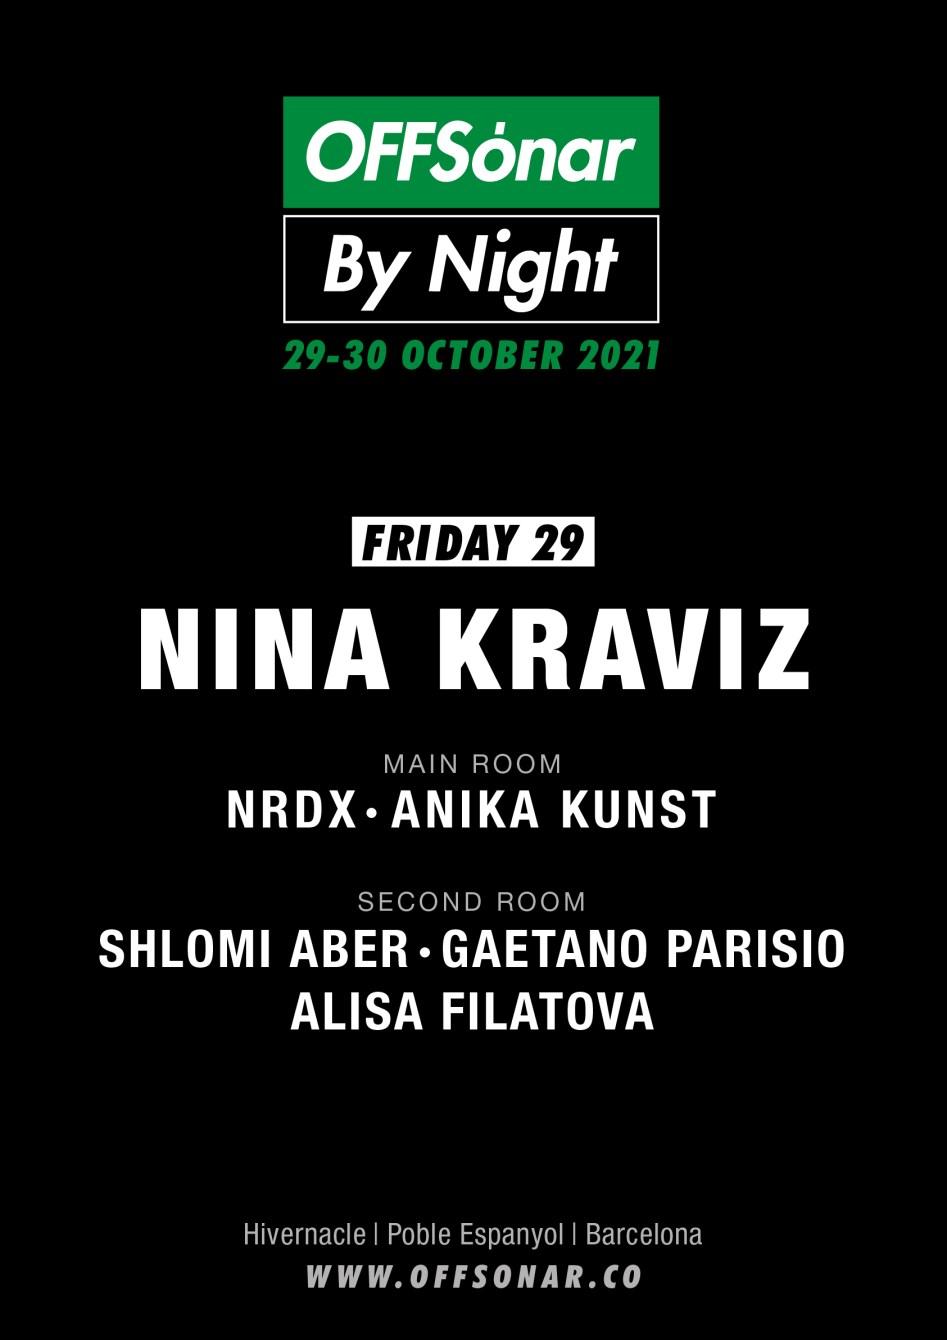 OFFSónar by Night con Nina Kraviz, Ndrx, Anika Kunst y más - Flyer front